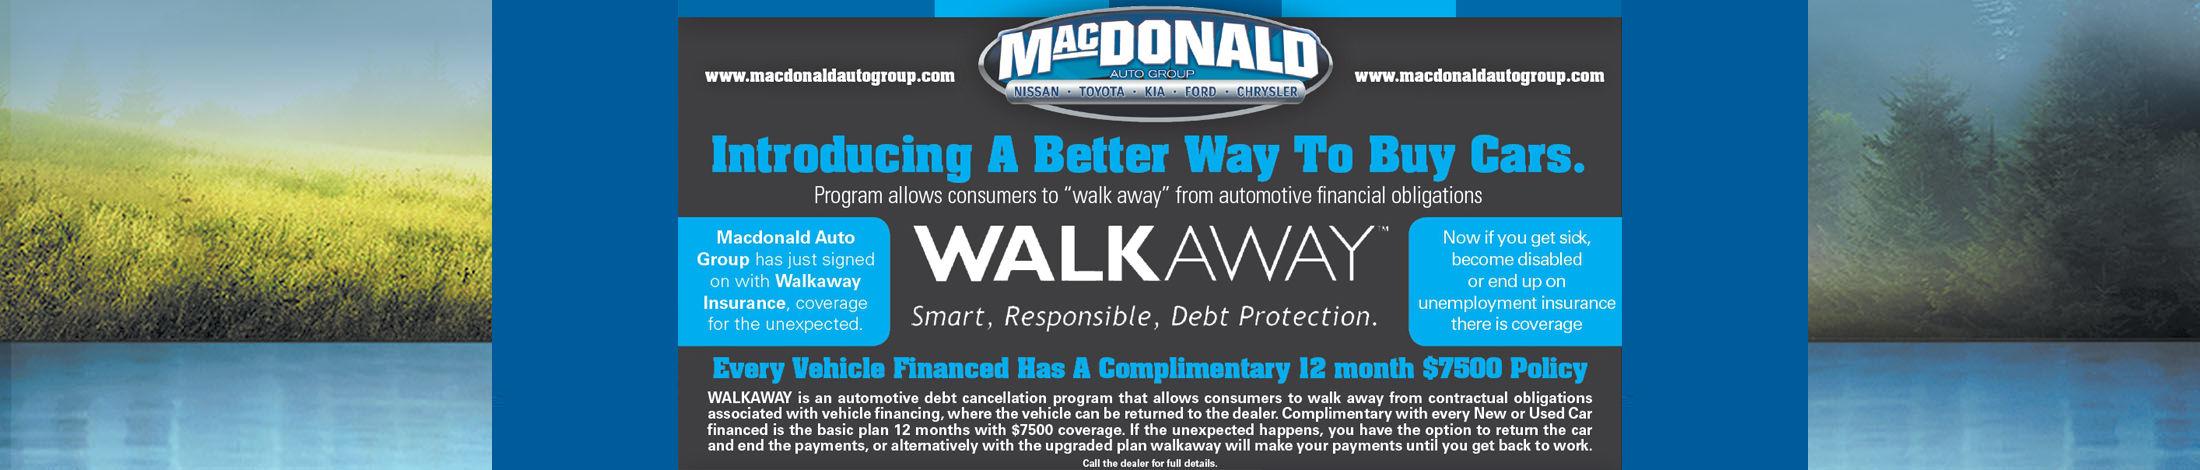 Walk Away Promotion